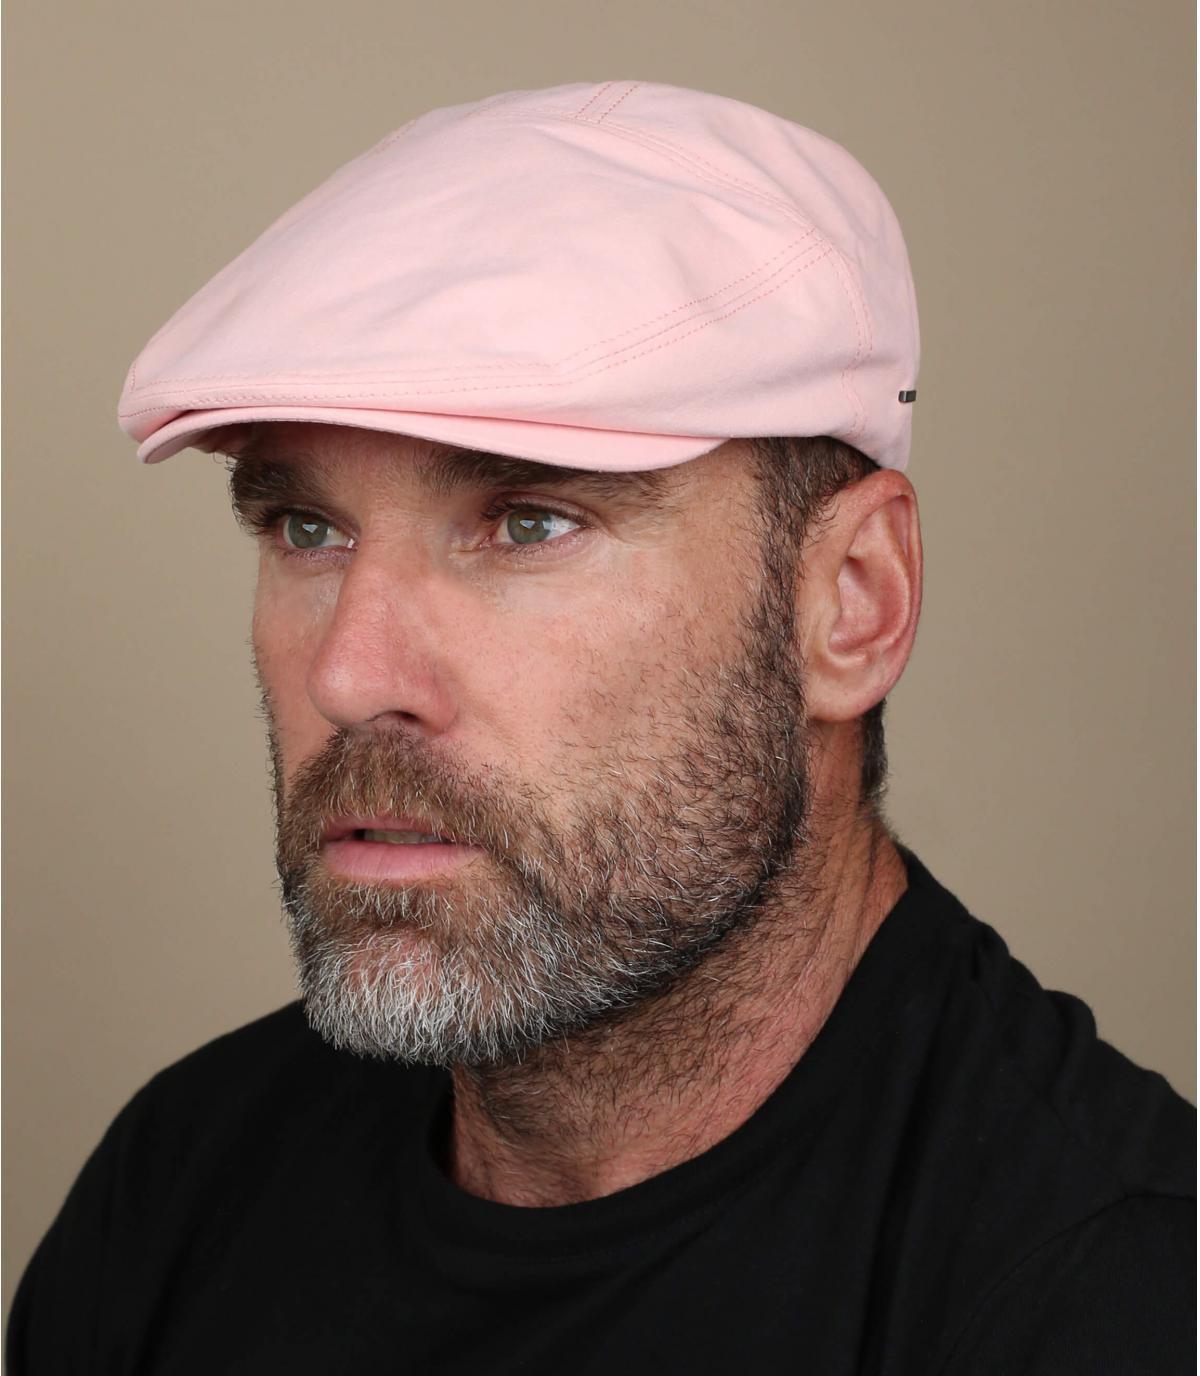 Barett rosa Baumwolle